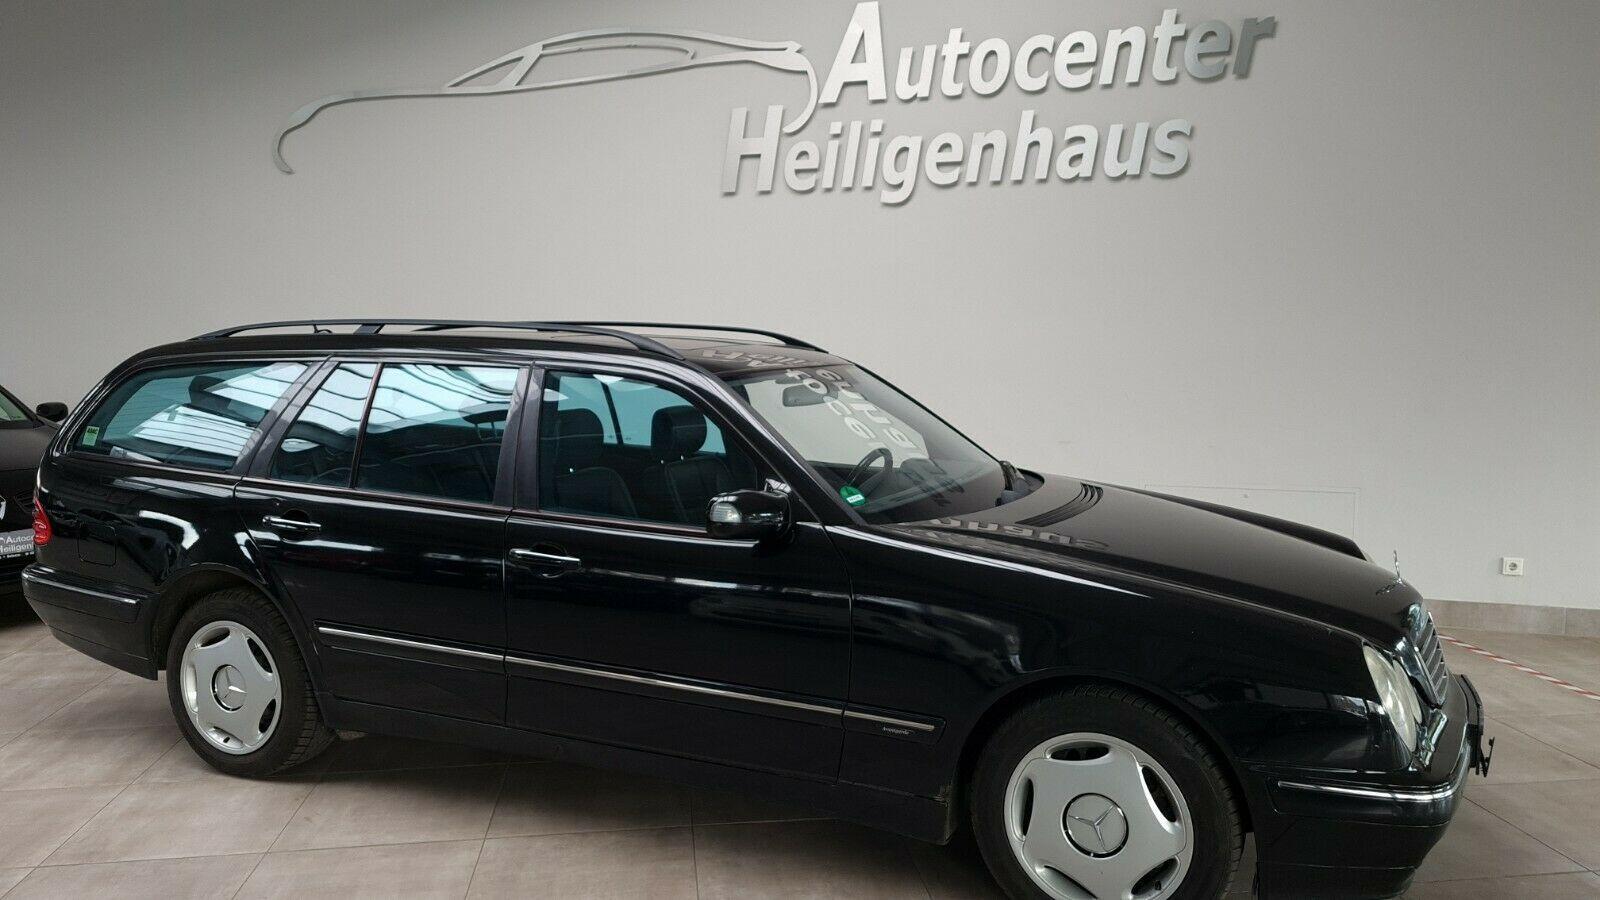 MERCEDES-BENZ E 320 T Avantgarde Automatik Schiebedach Navi